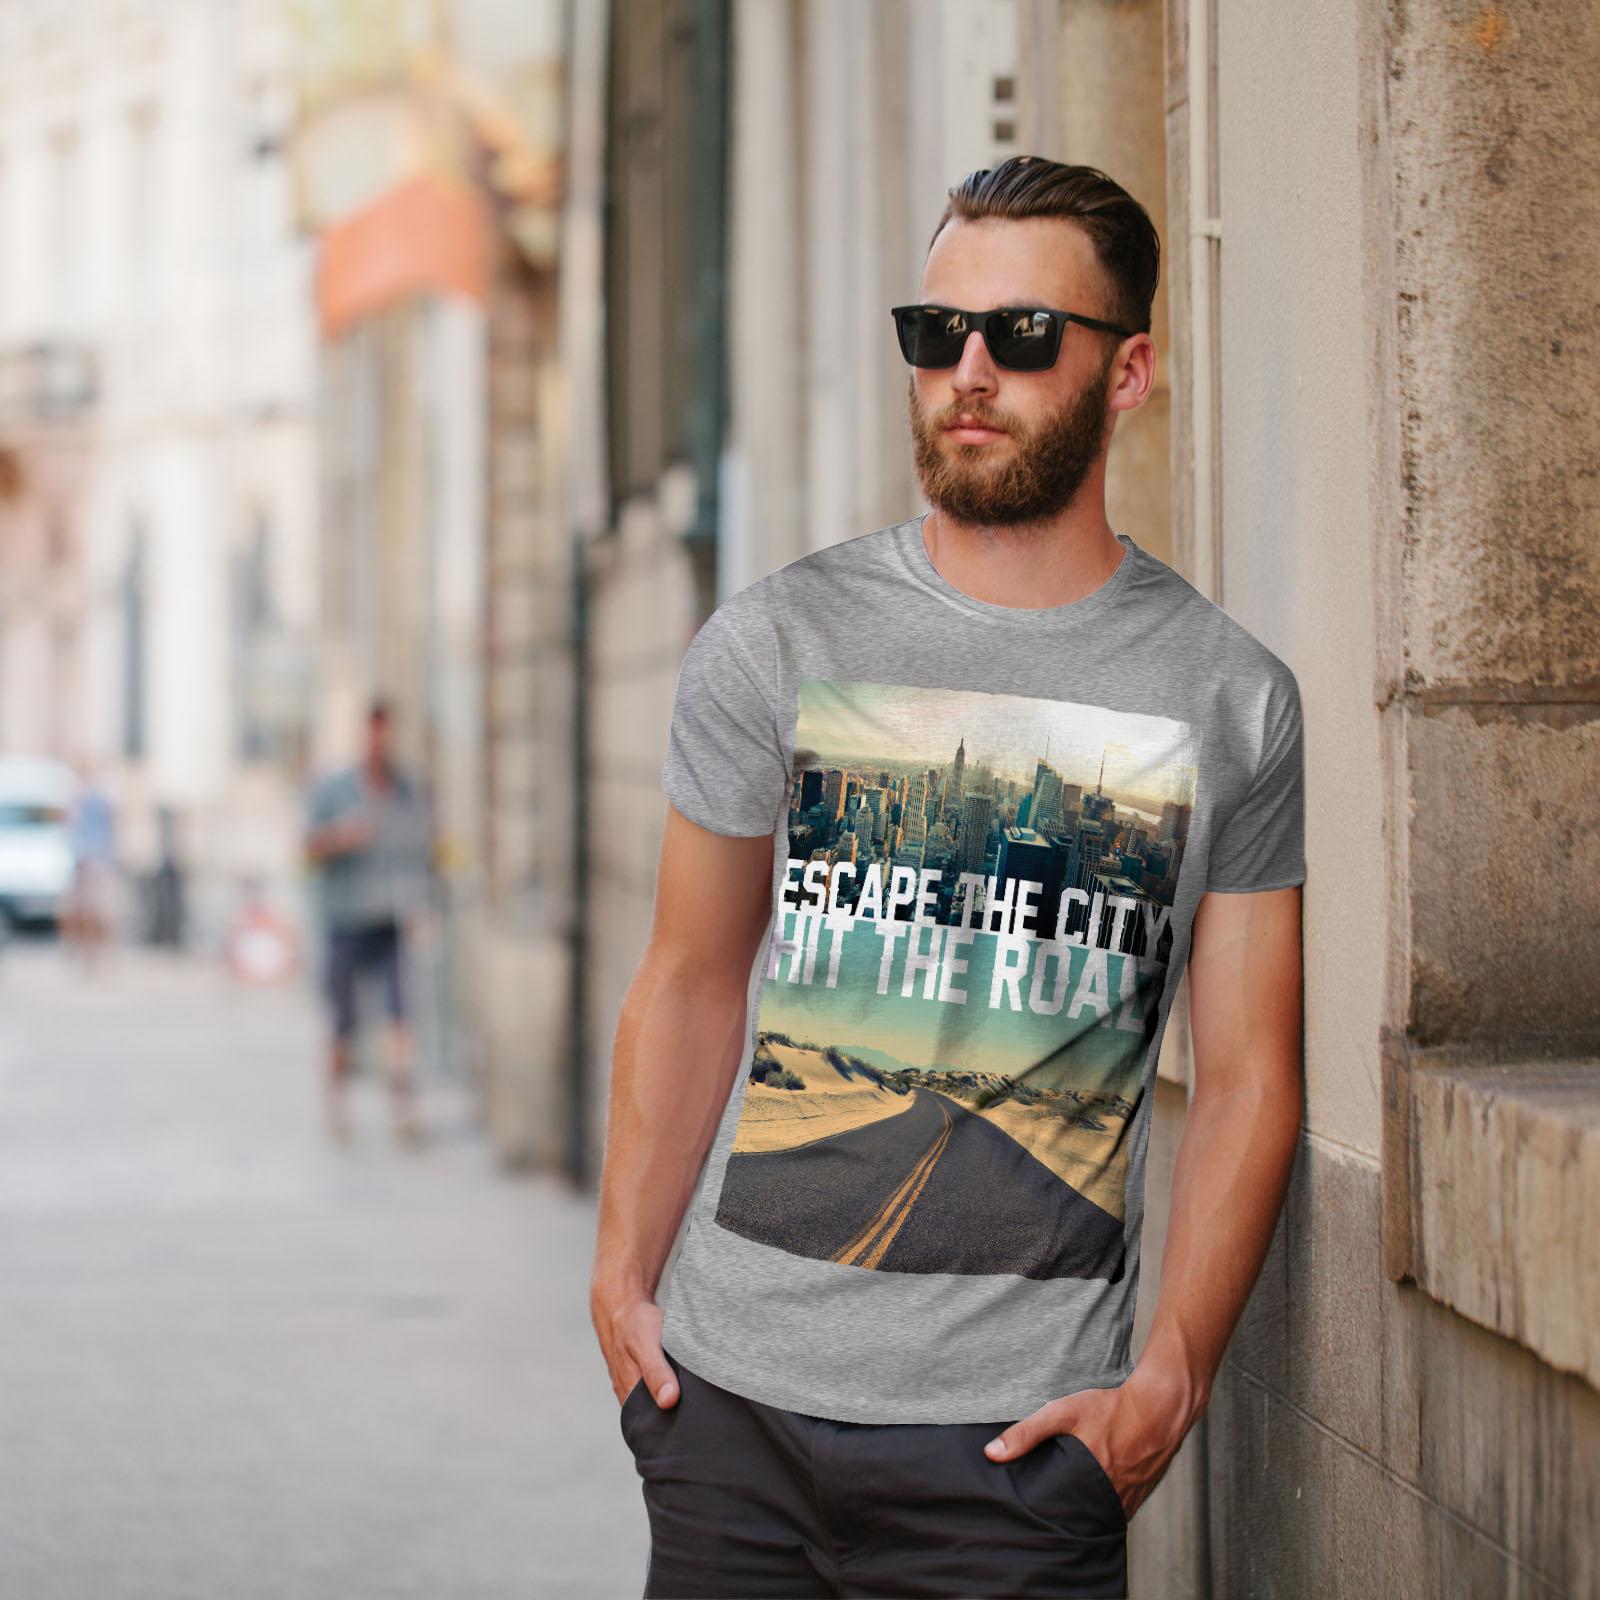 Wellcoda-Escape-The-City-Herren-T-Shirt-Lifestyle-Grafikdesign-Printed-Tee Indexbild 17